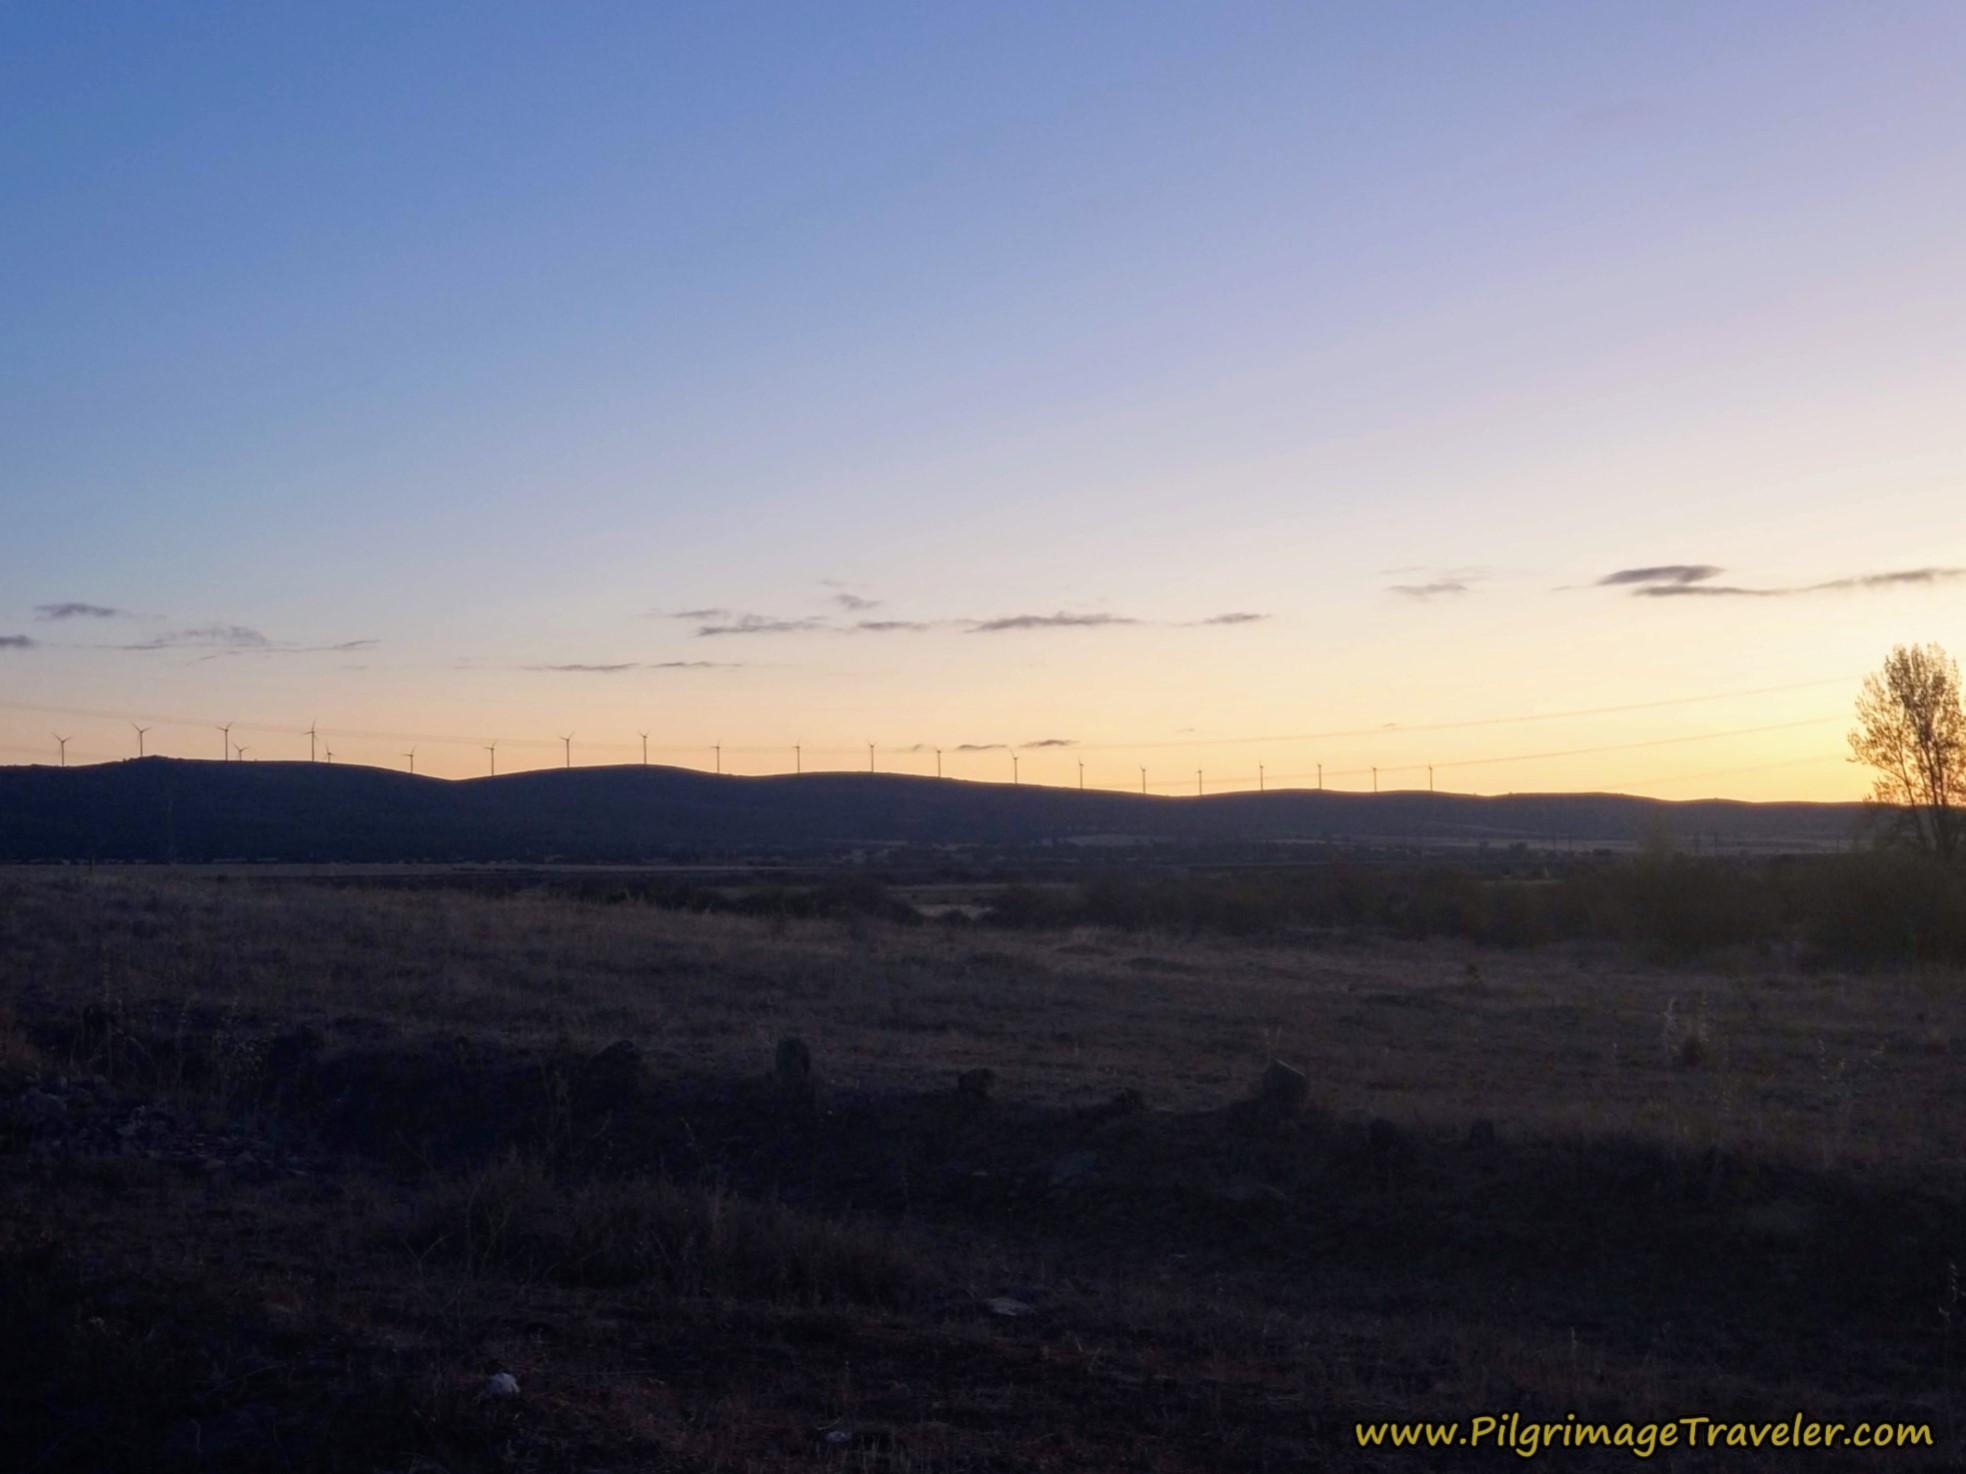 Windmills in Silhouette on the Ridge